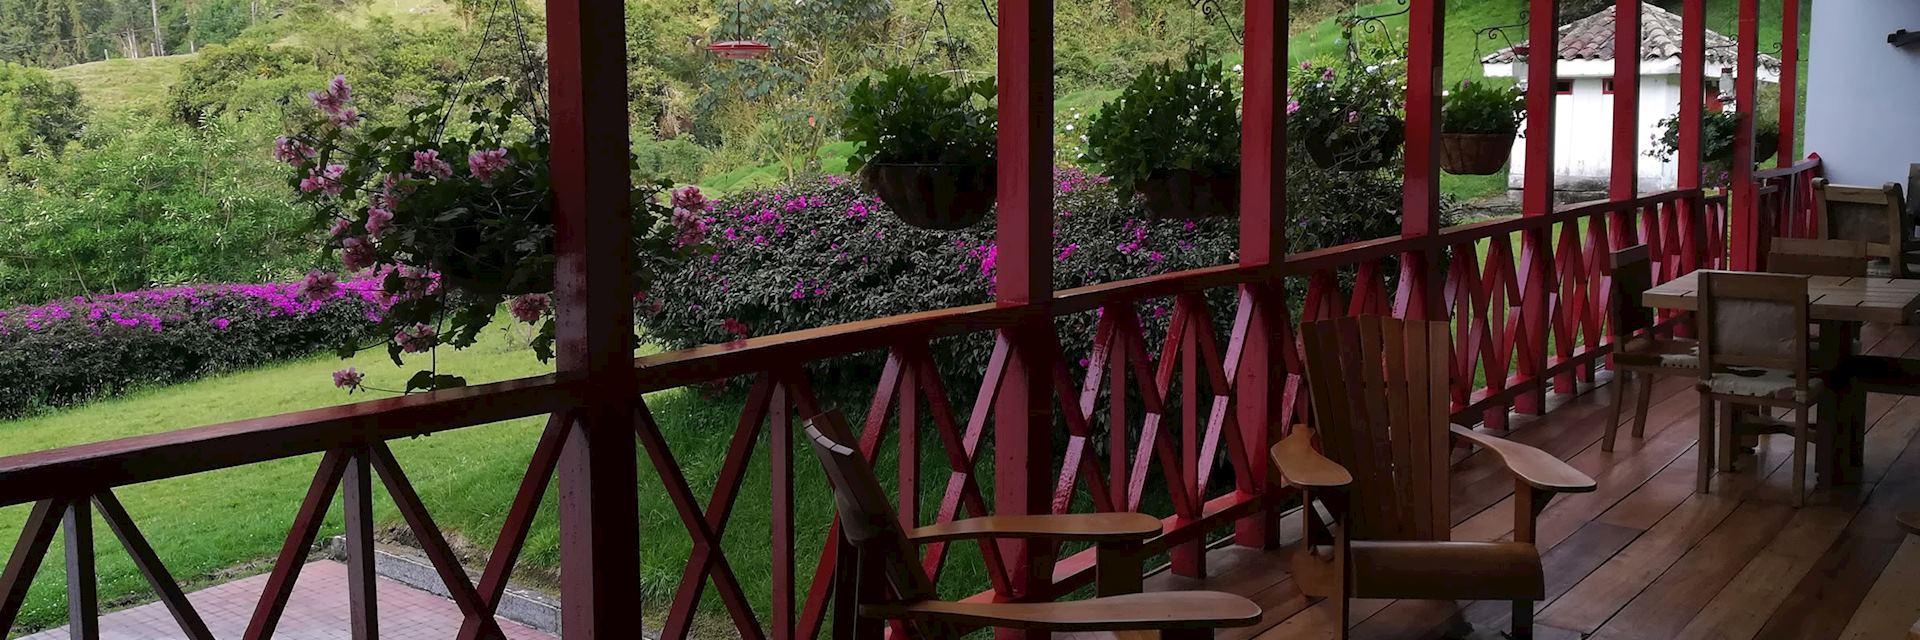 Hacienda Termales La Quinta